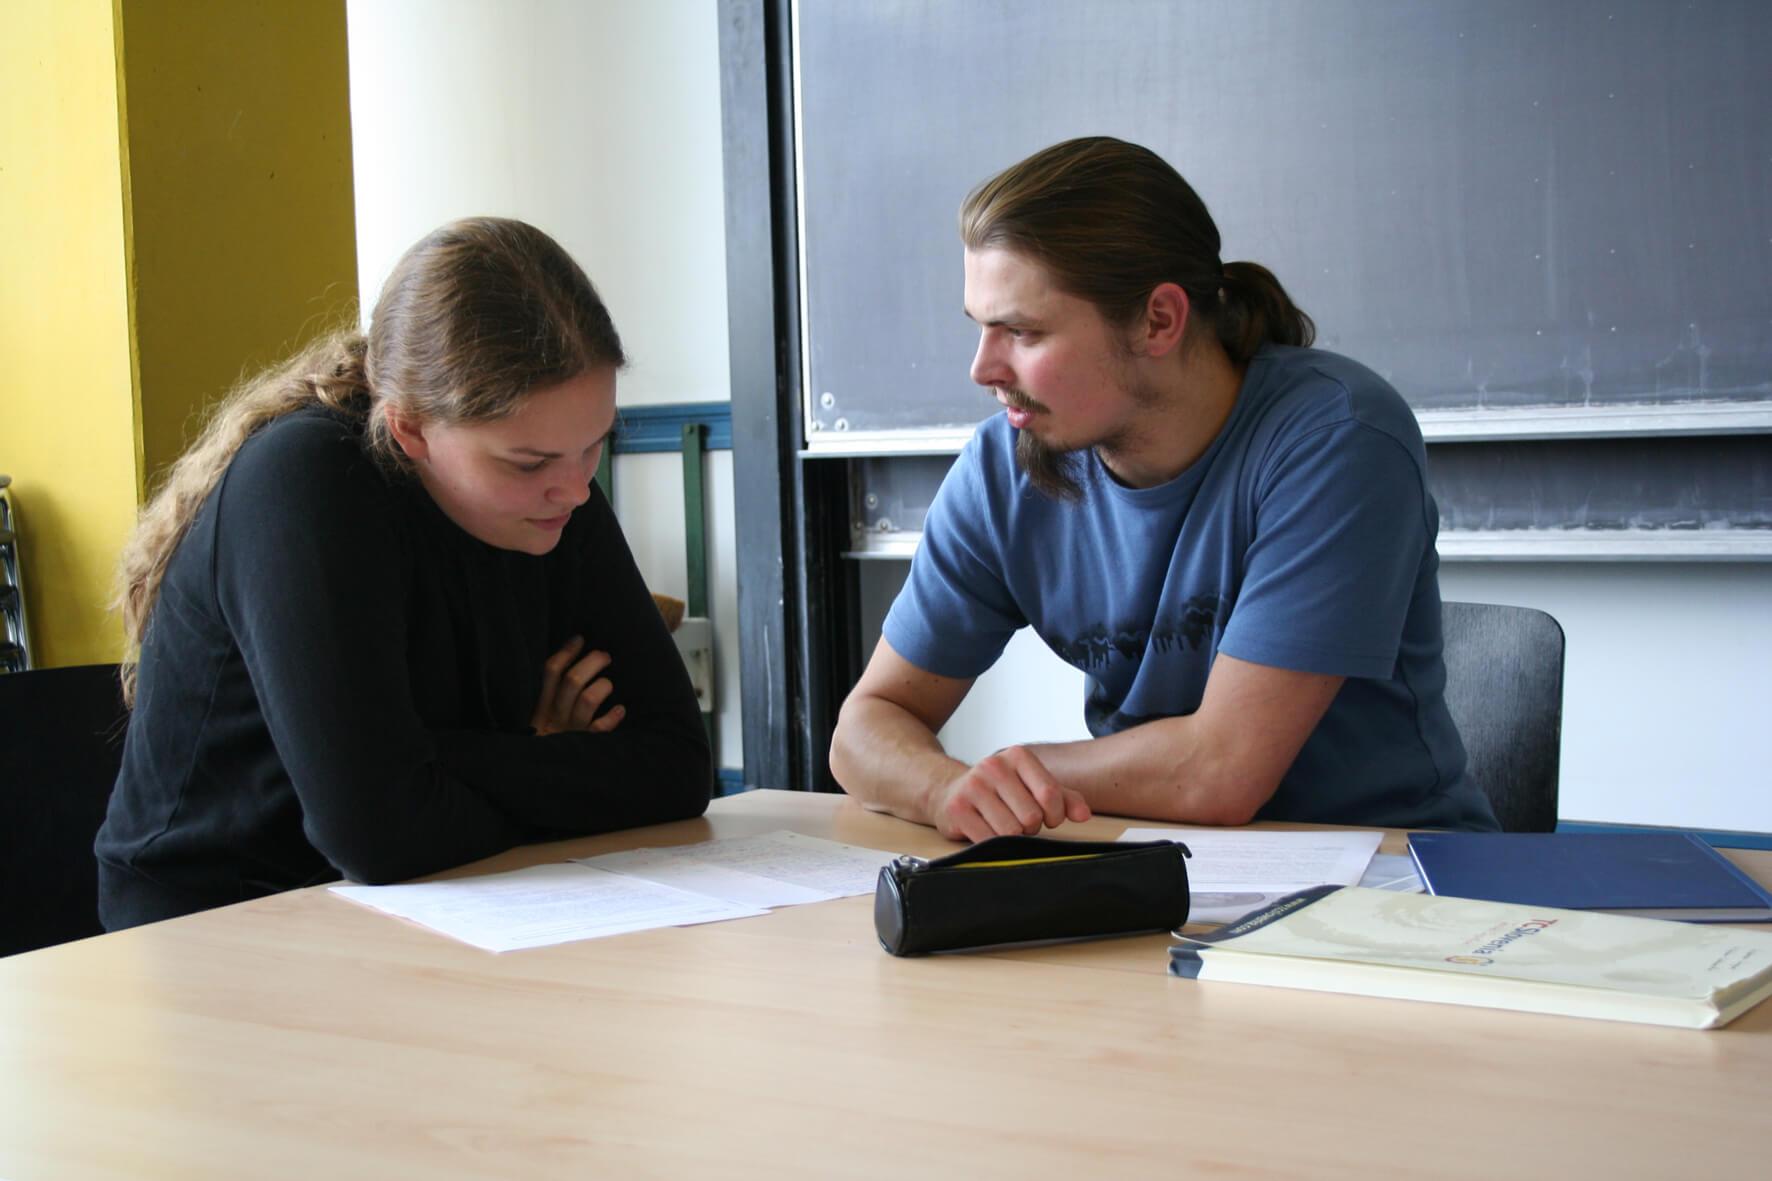 academia linguae latein lernen